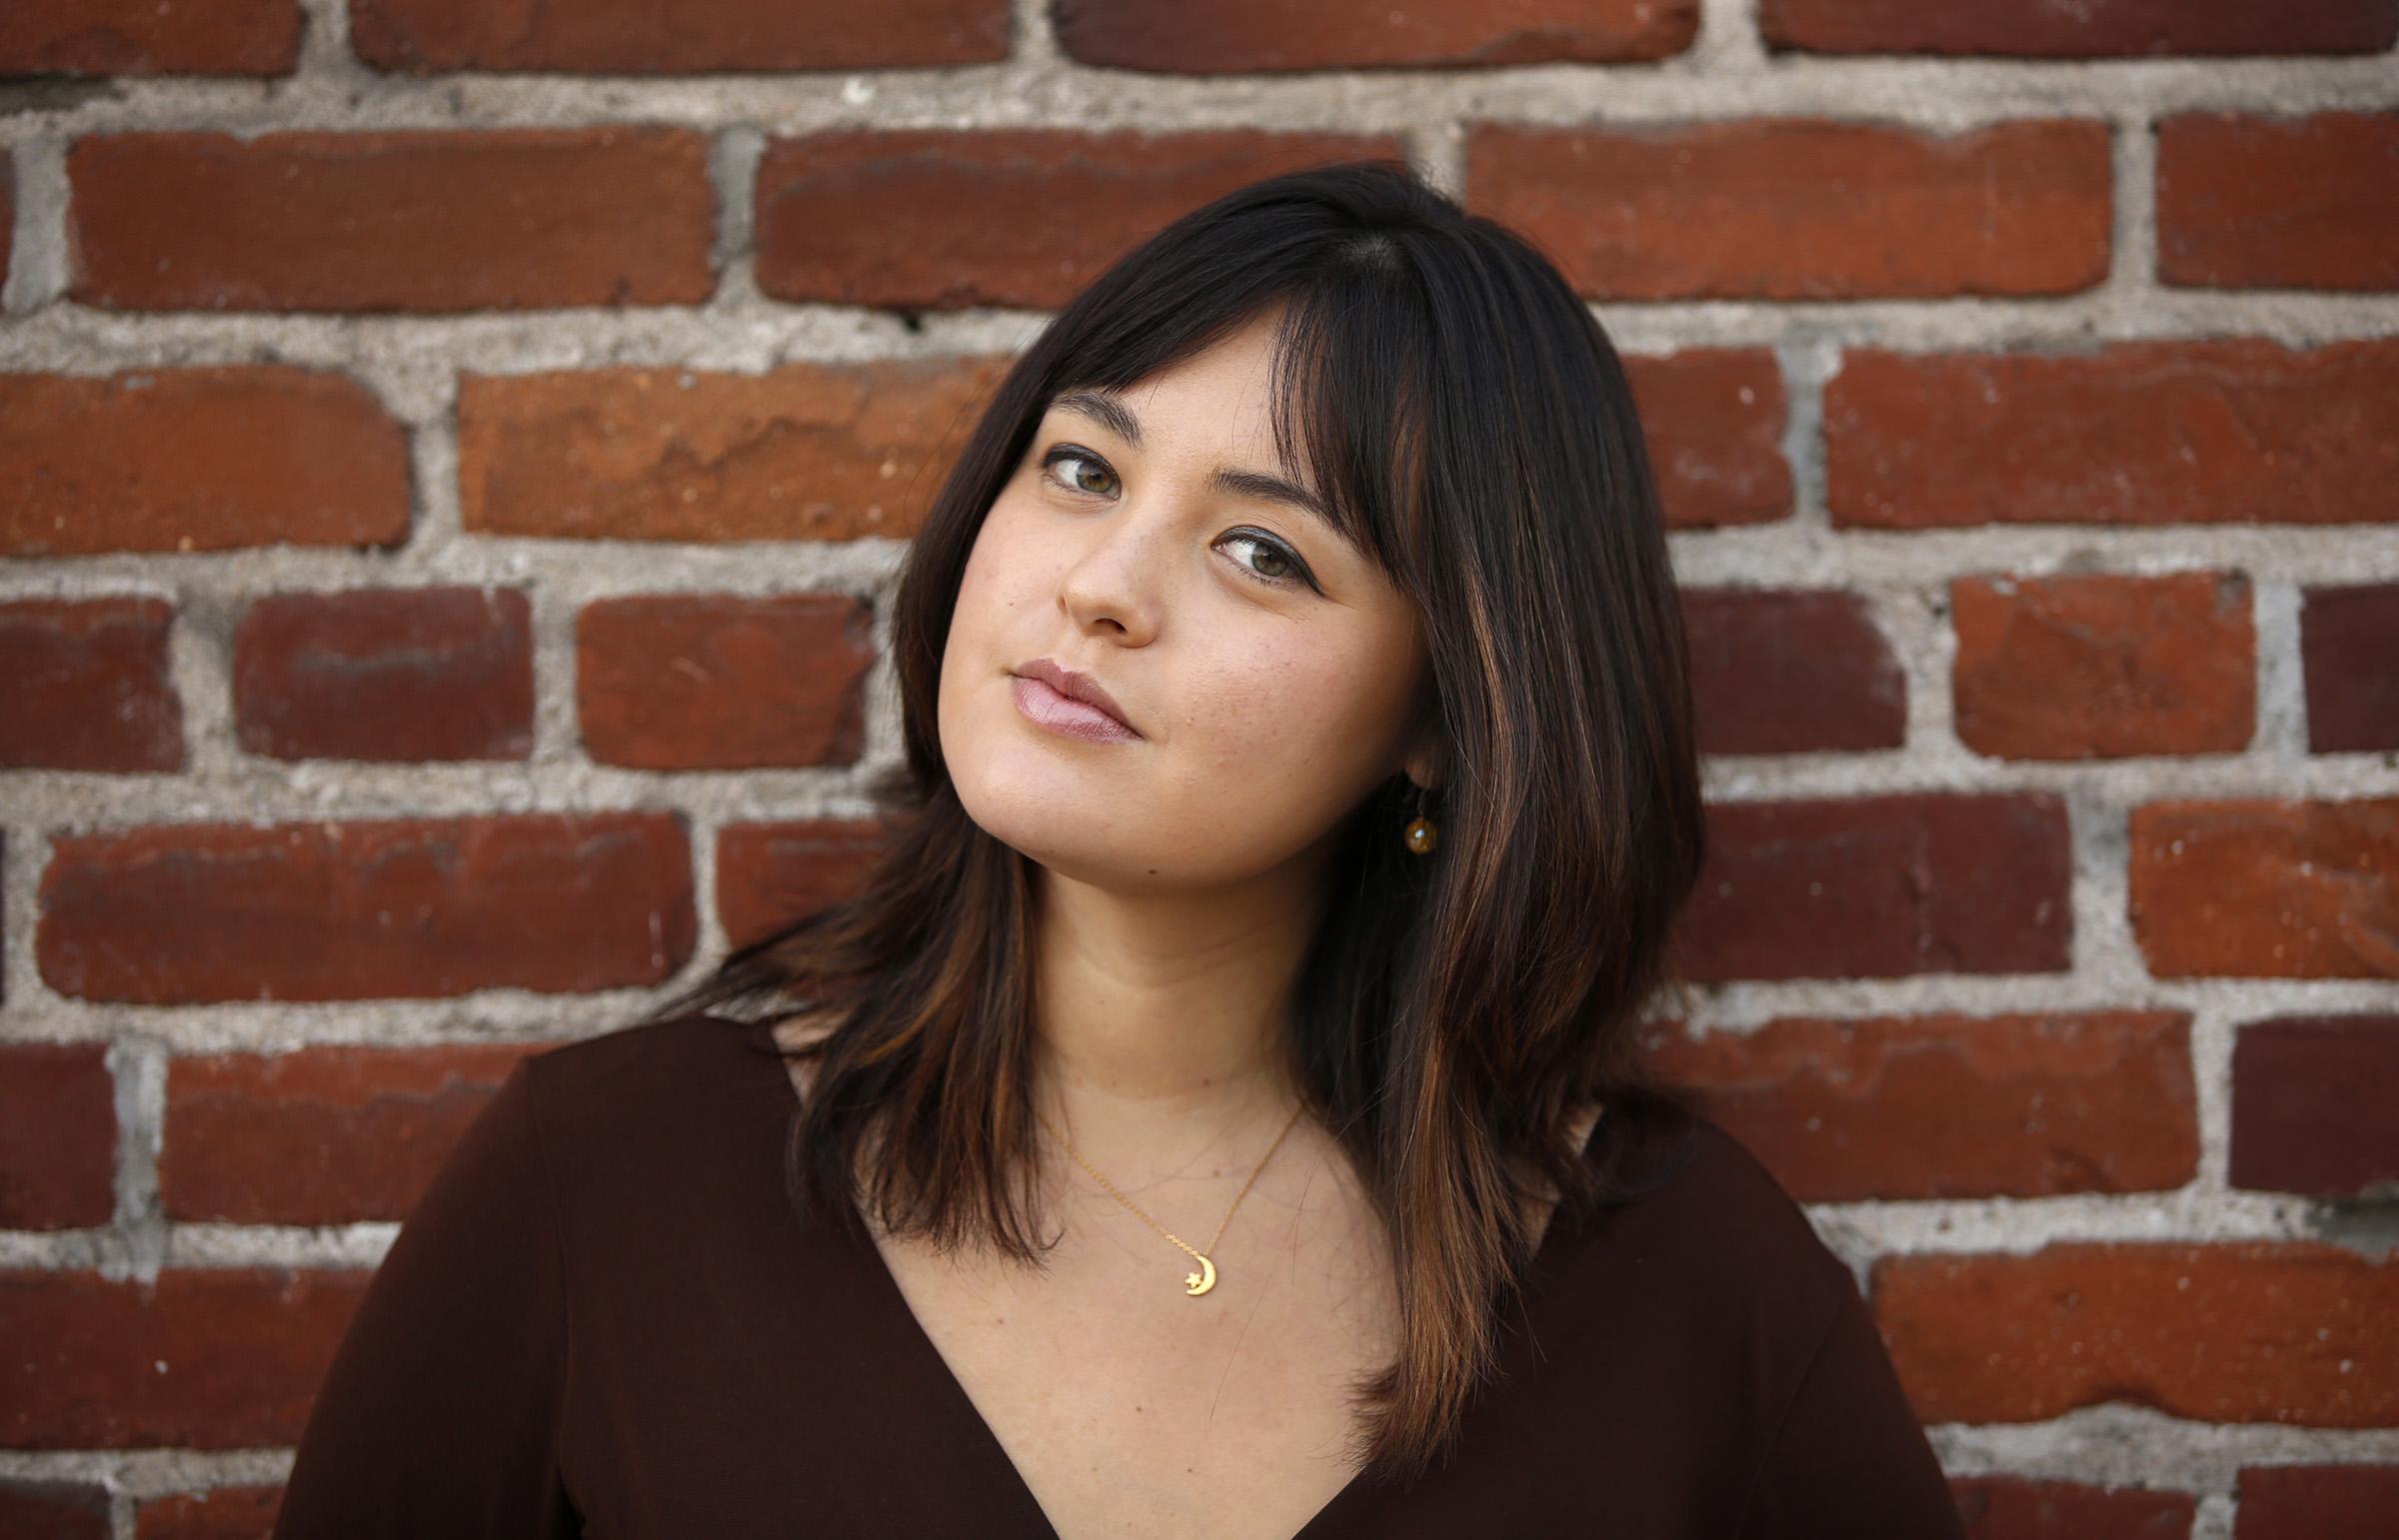 Playwright Leah Nanako